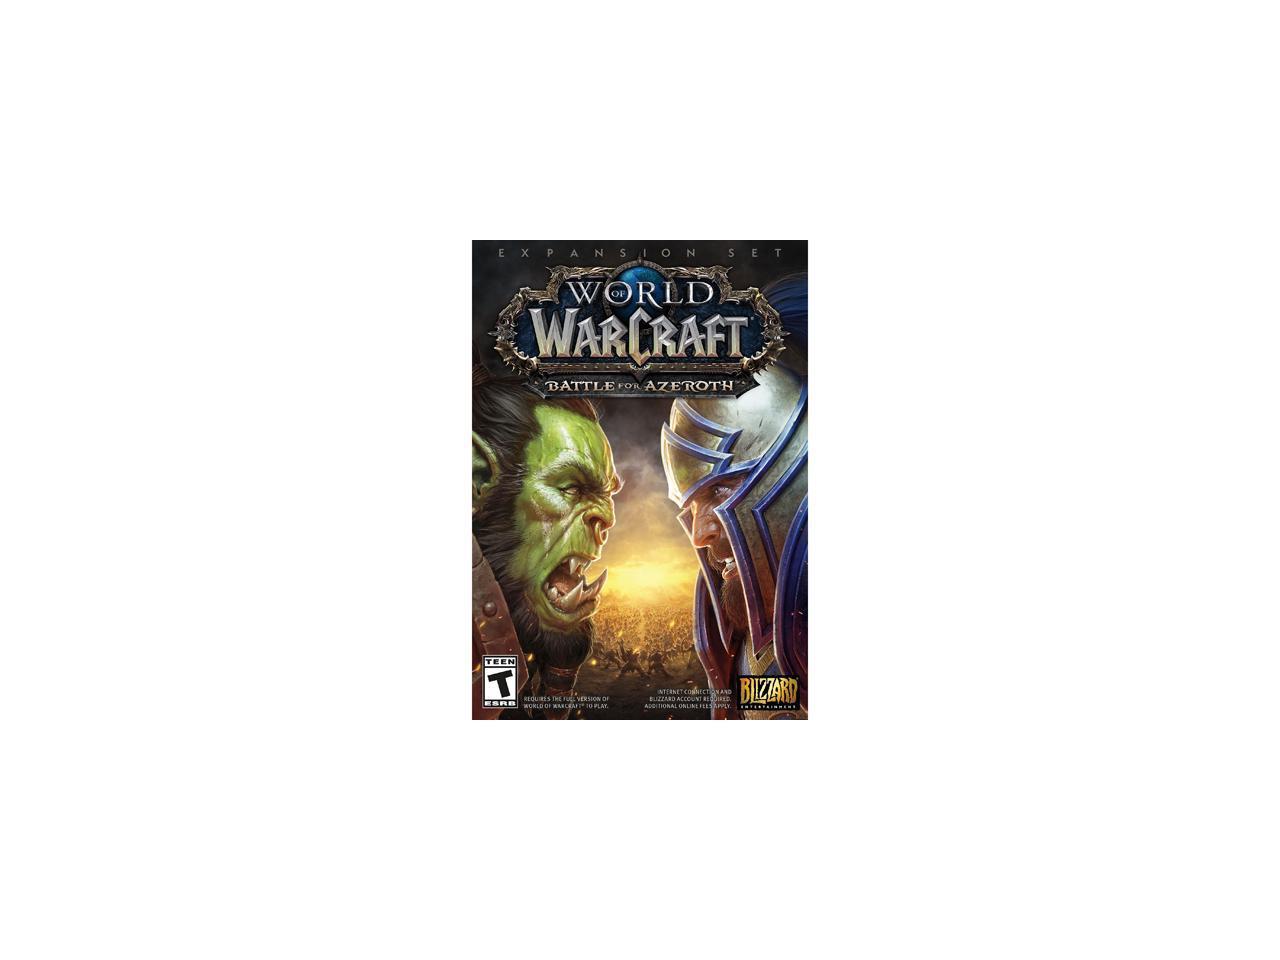 World of Warcraft: Battle For Azeroth PC $39.99 newegg